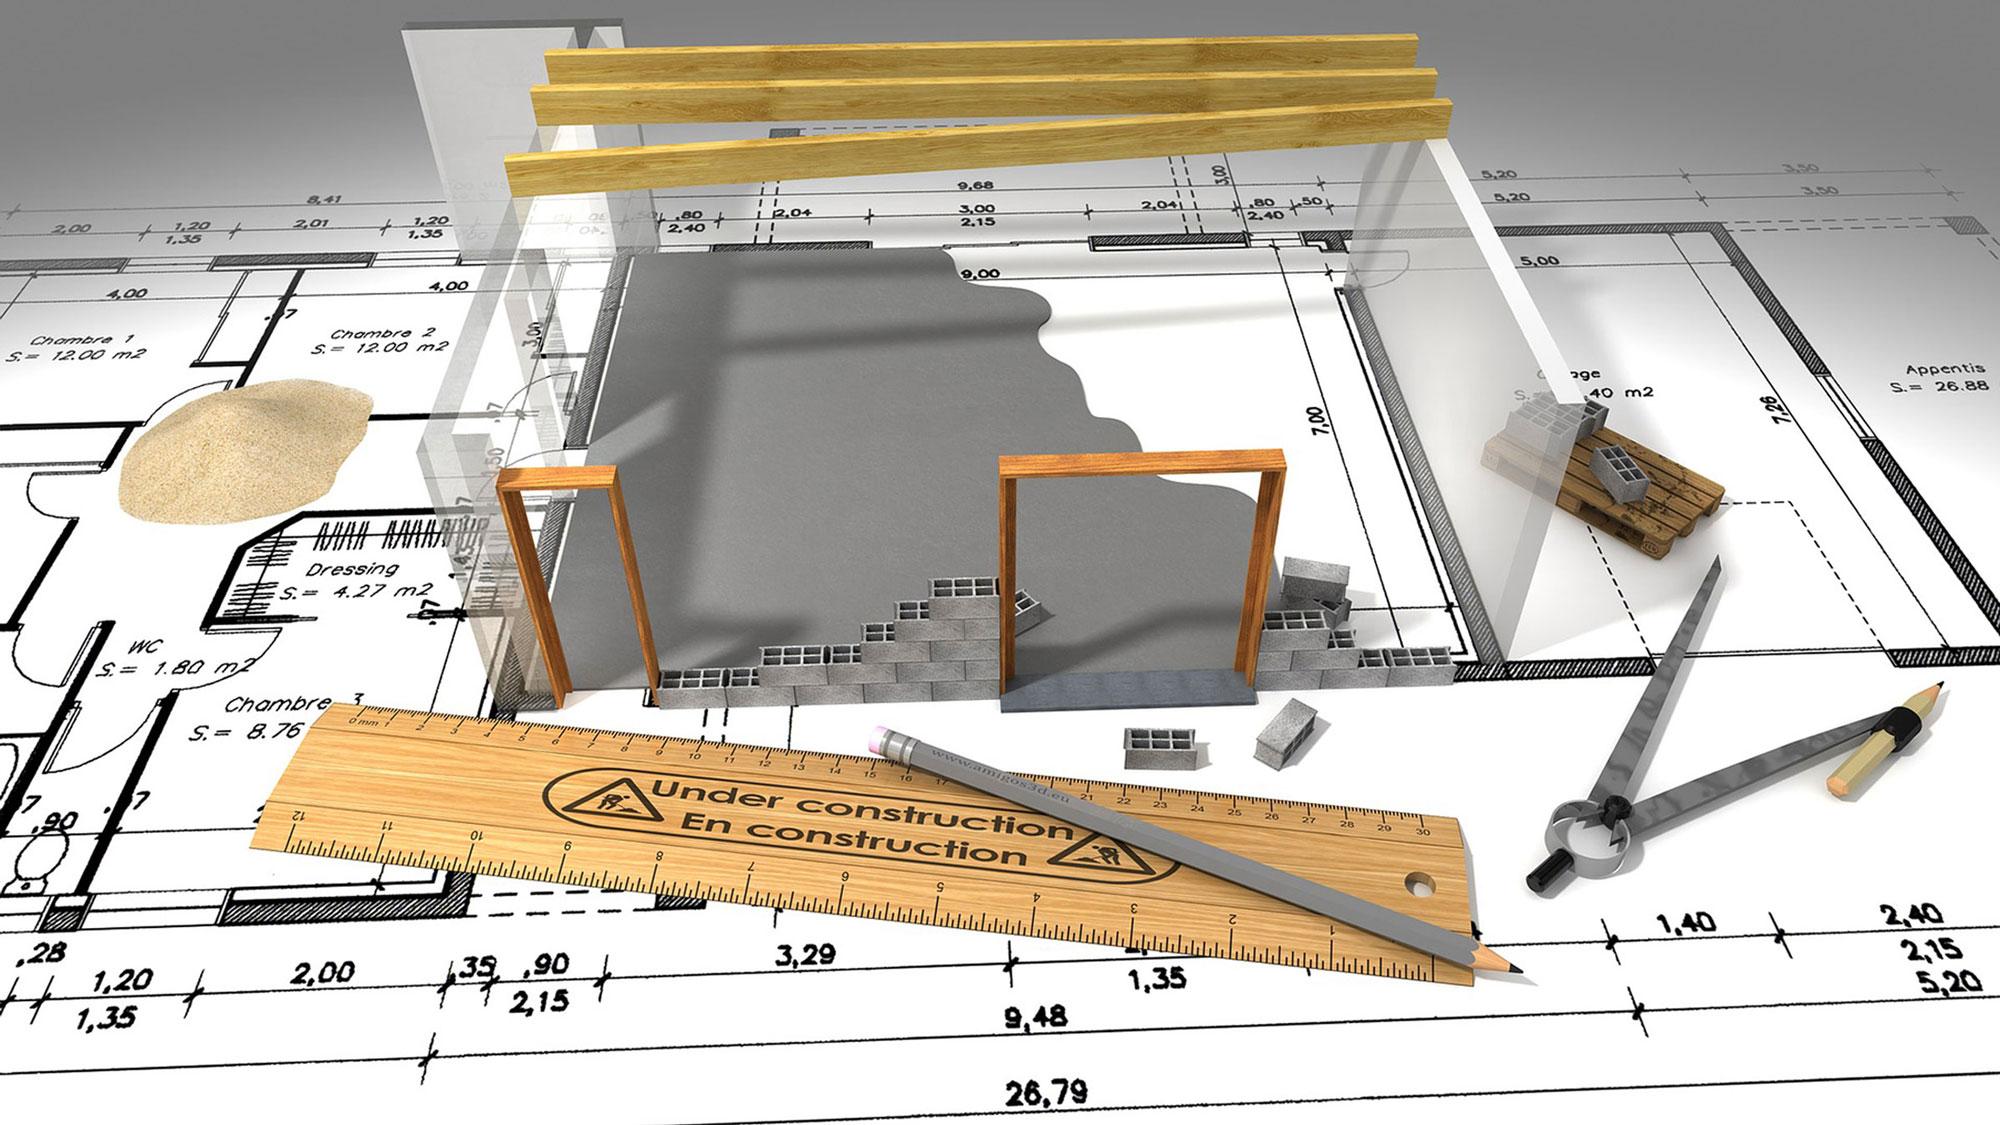 architectuur-planning-en-constructie-v2